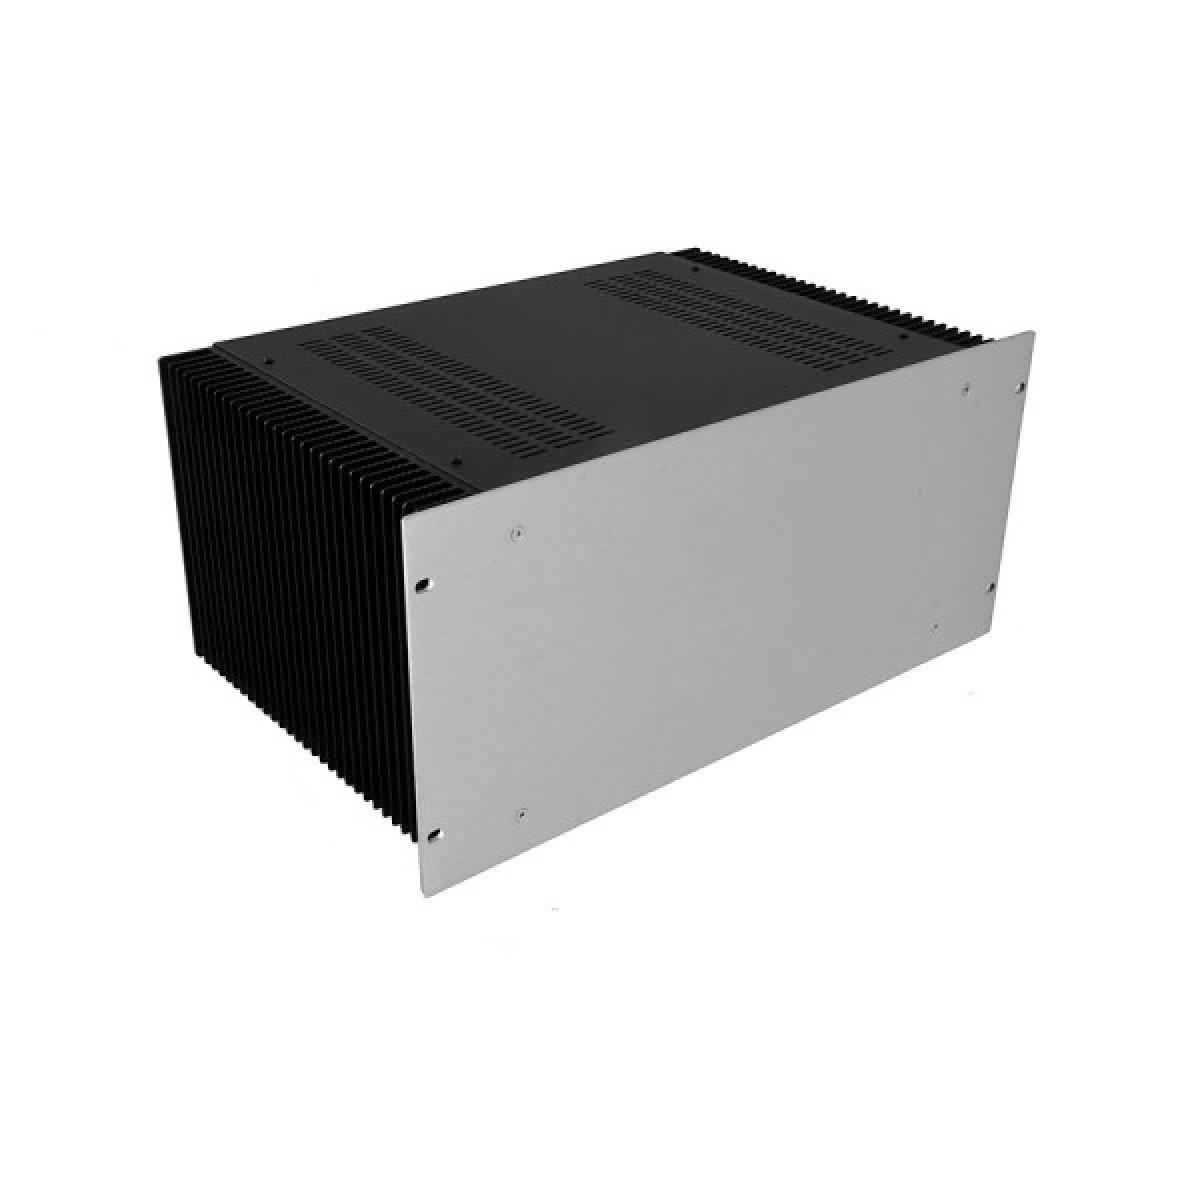 FirstWatt. Cajas y disipadores DSC_8217-600x600-1200x1200